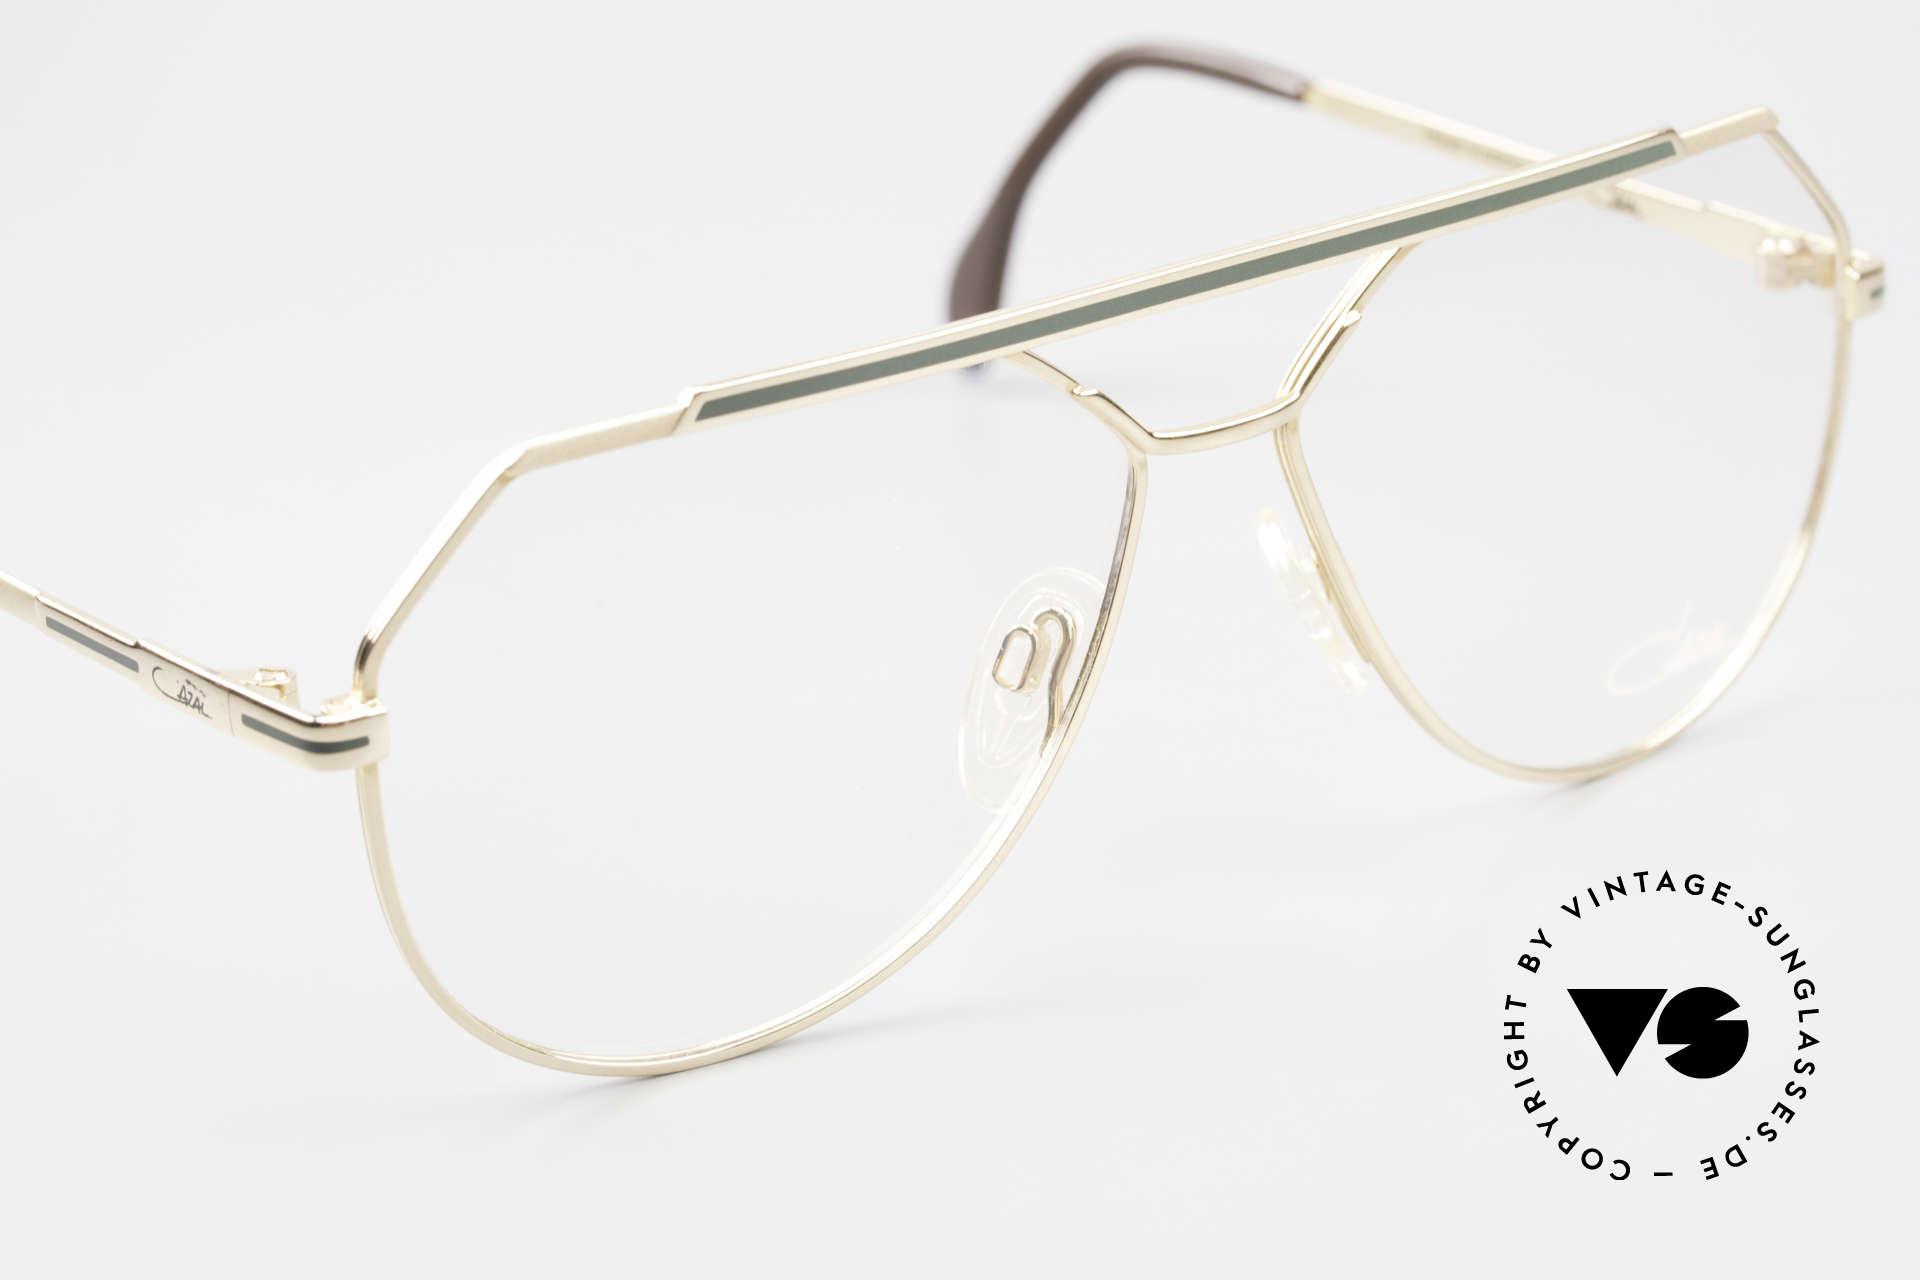 Cazal 733 Old Cazal Aviator Eyeglasses, NO RETRO eyewear, but an old 'W.Germany' original, Made for Men